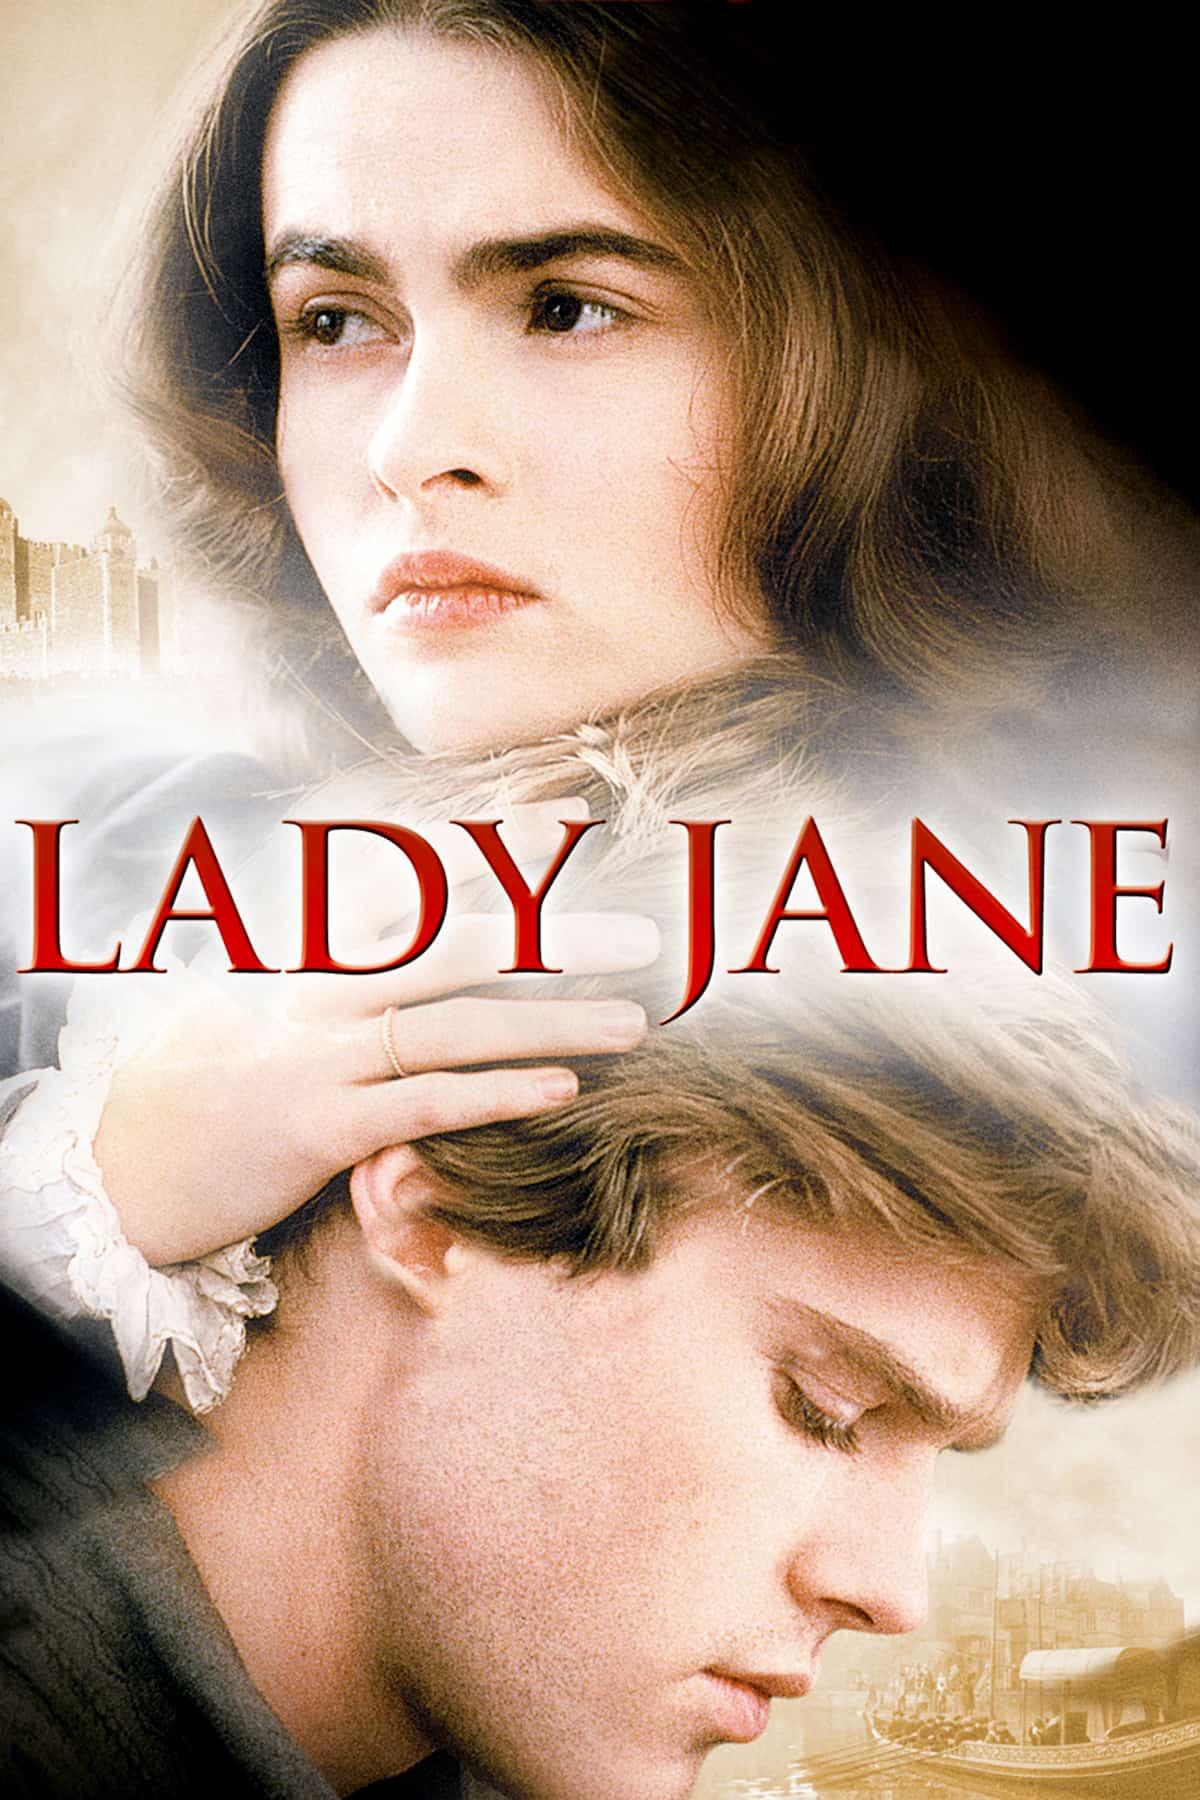 Lady Jane, 1986